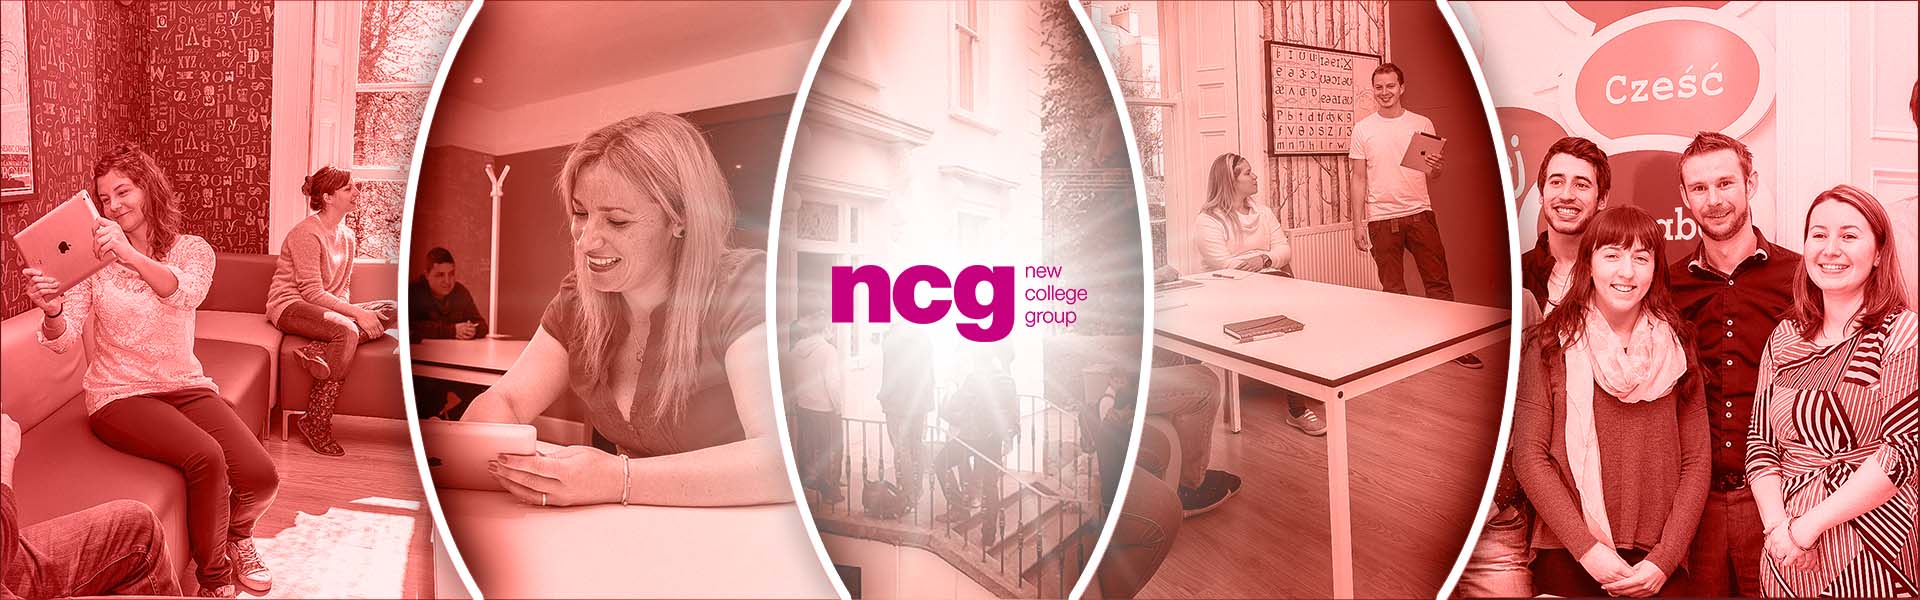 New College Group Dublin Dil Okulu